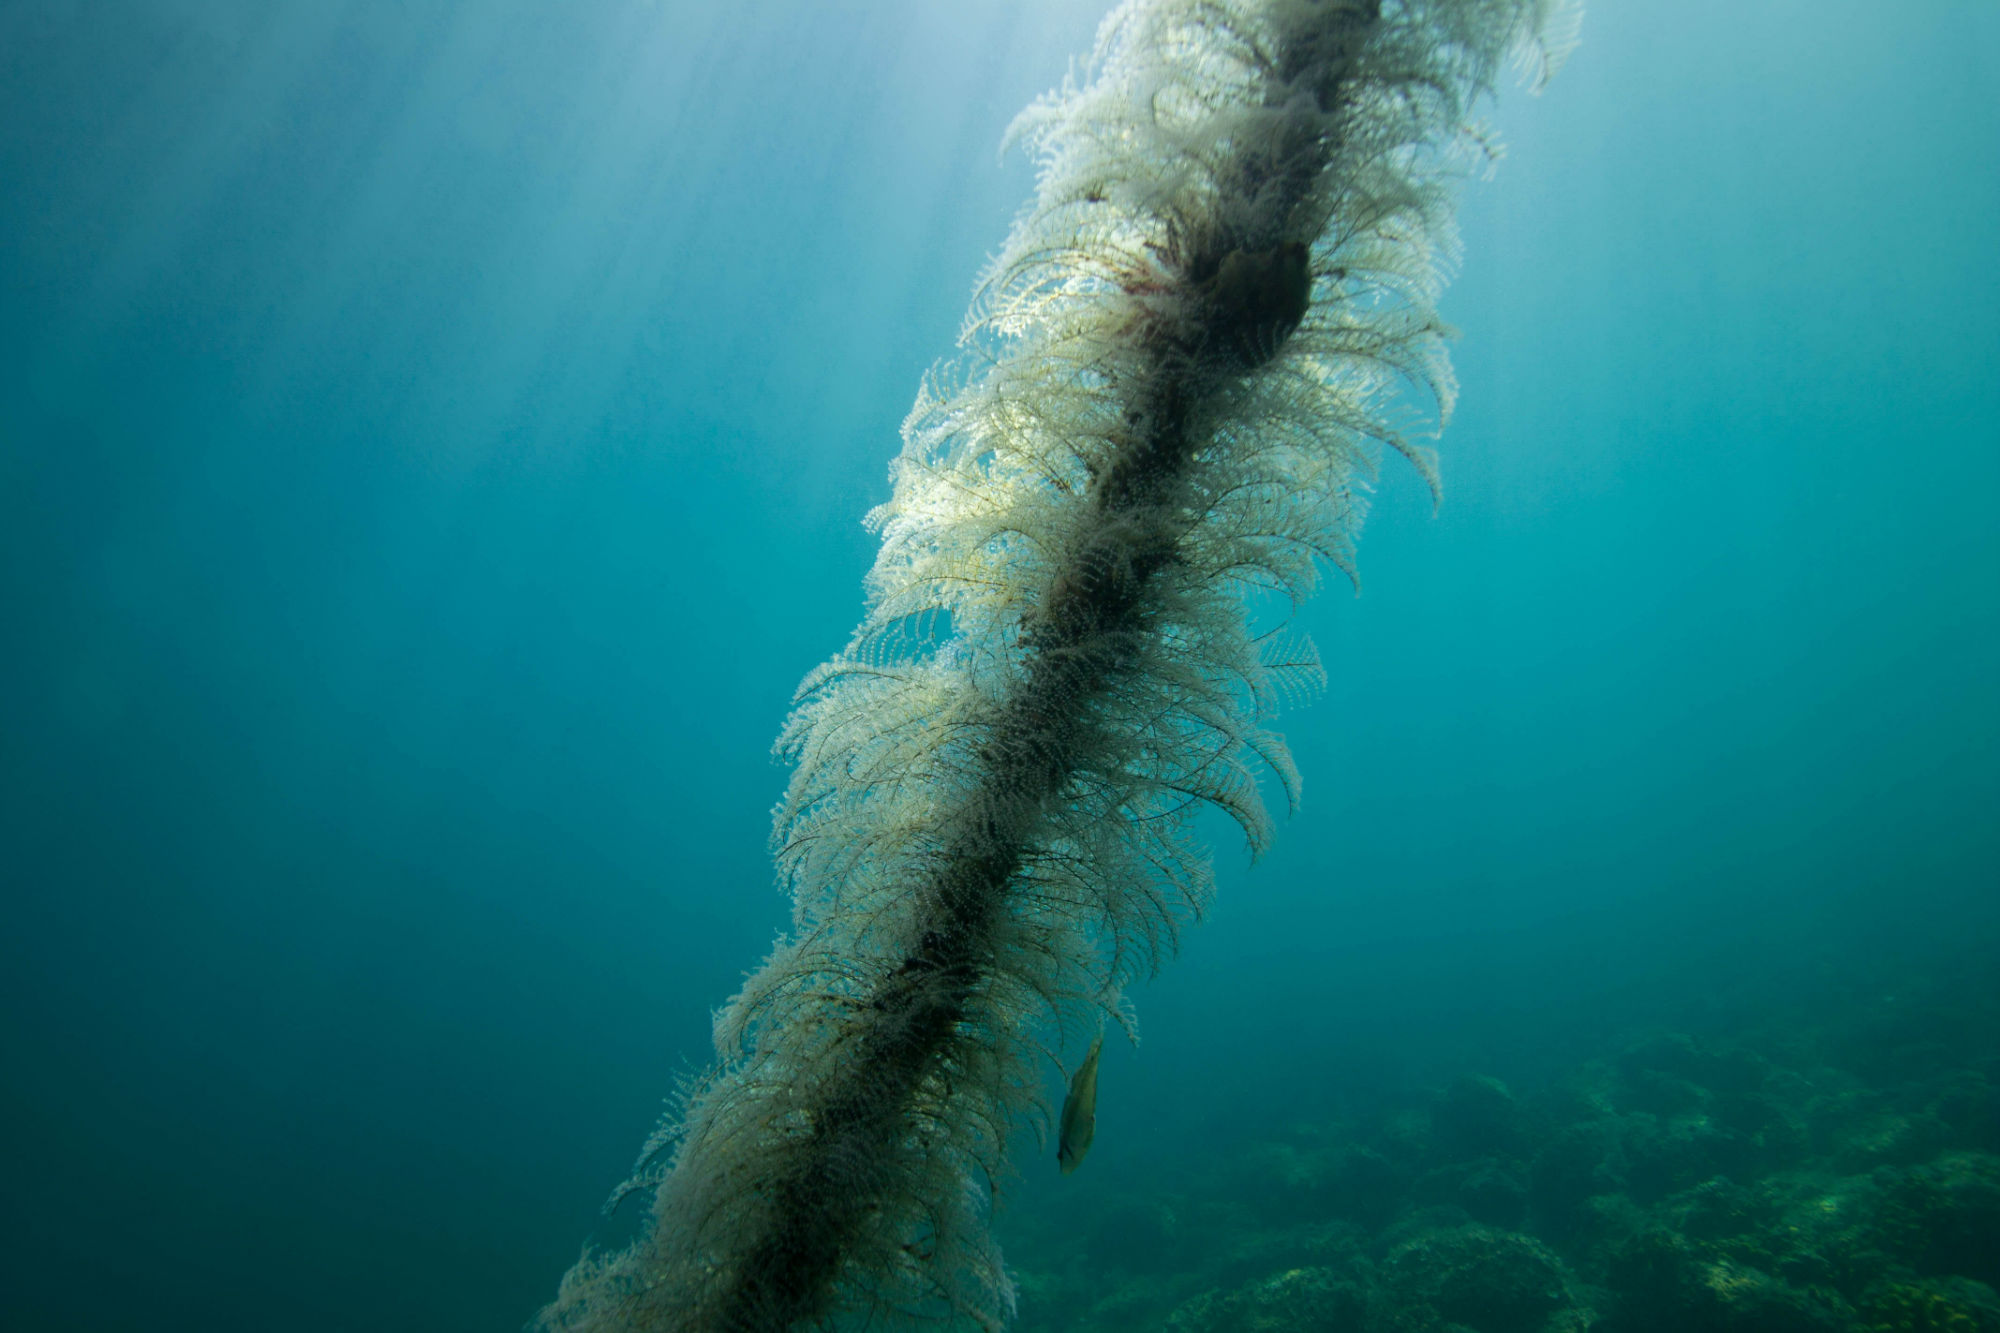 Underwater Rope in Slovenia